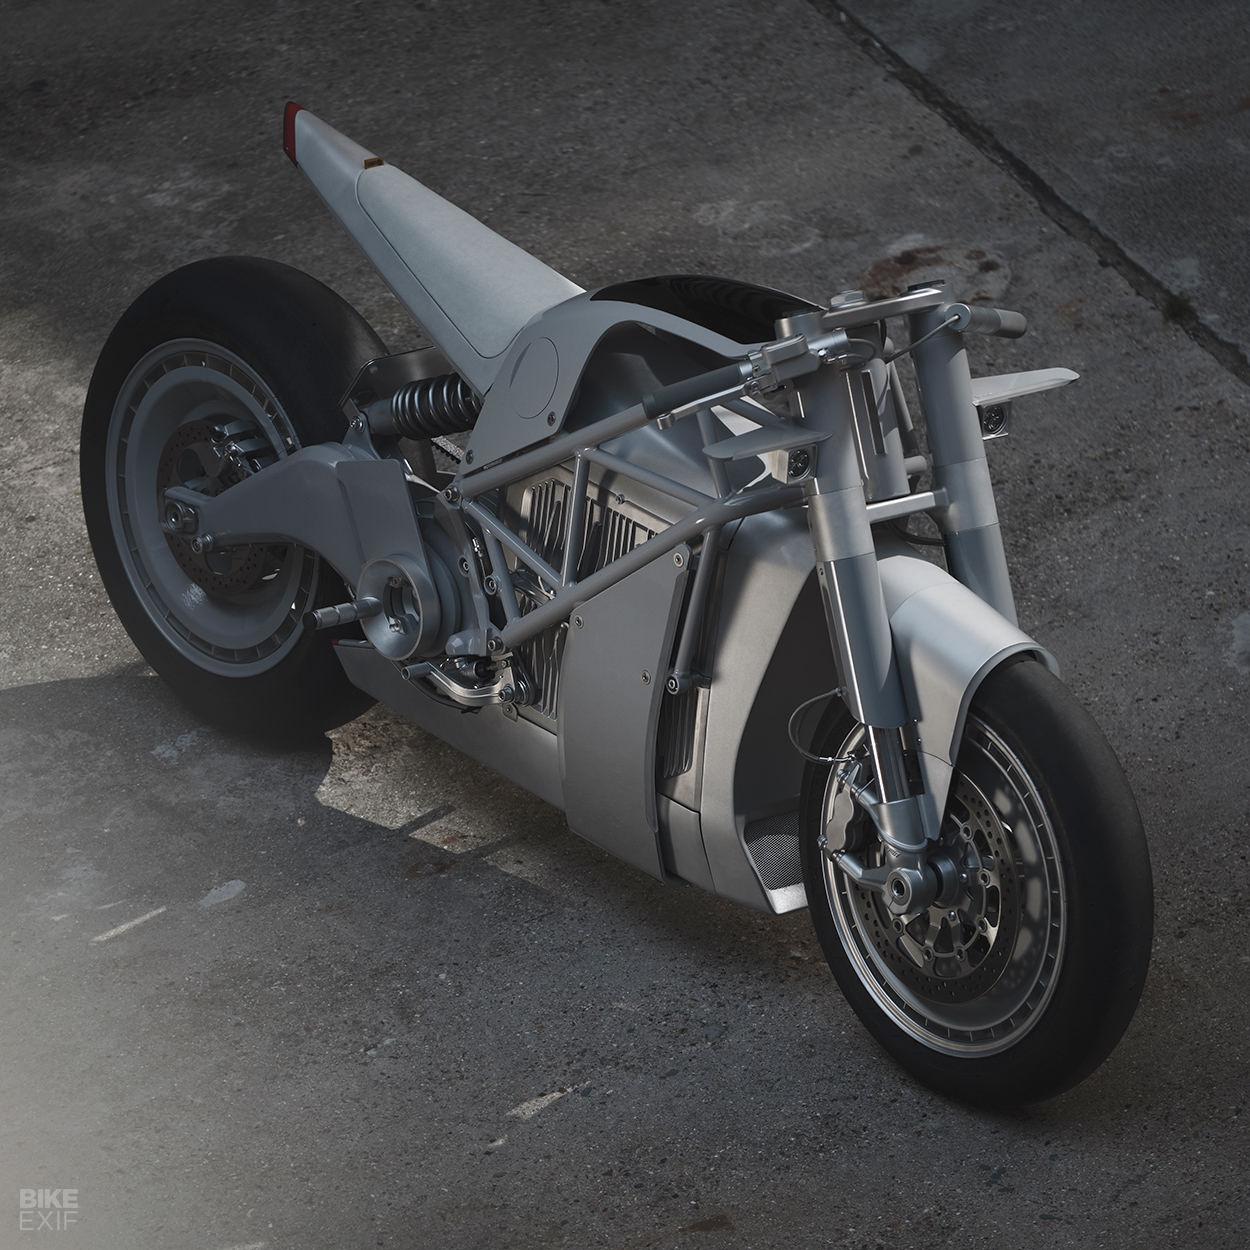 Custom Zero SR/F by Untitled Motorcycles